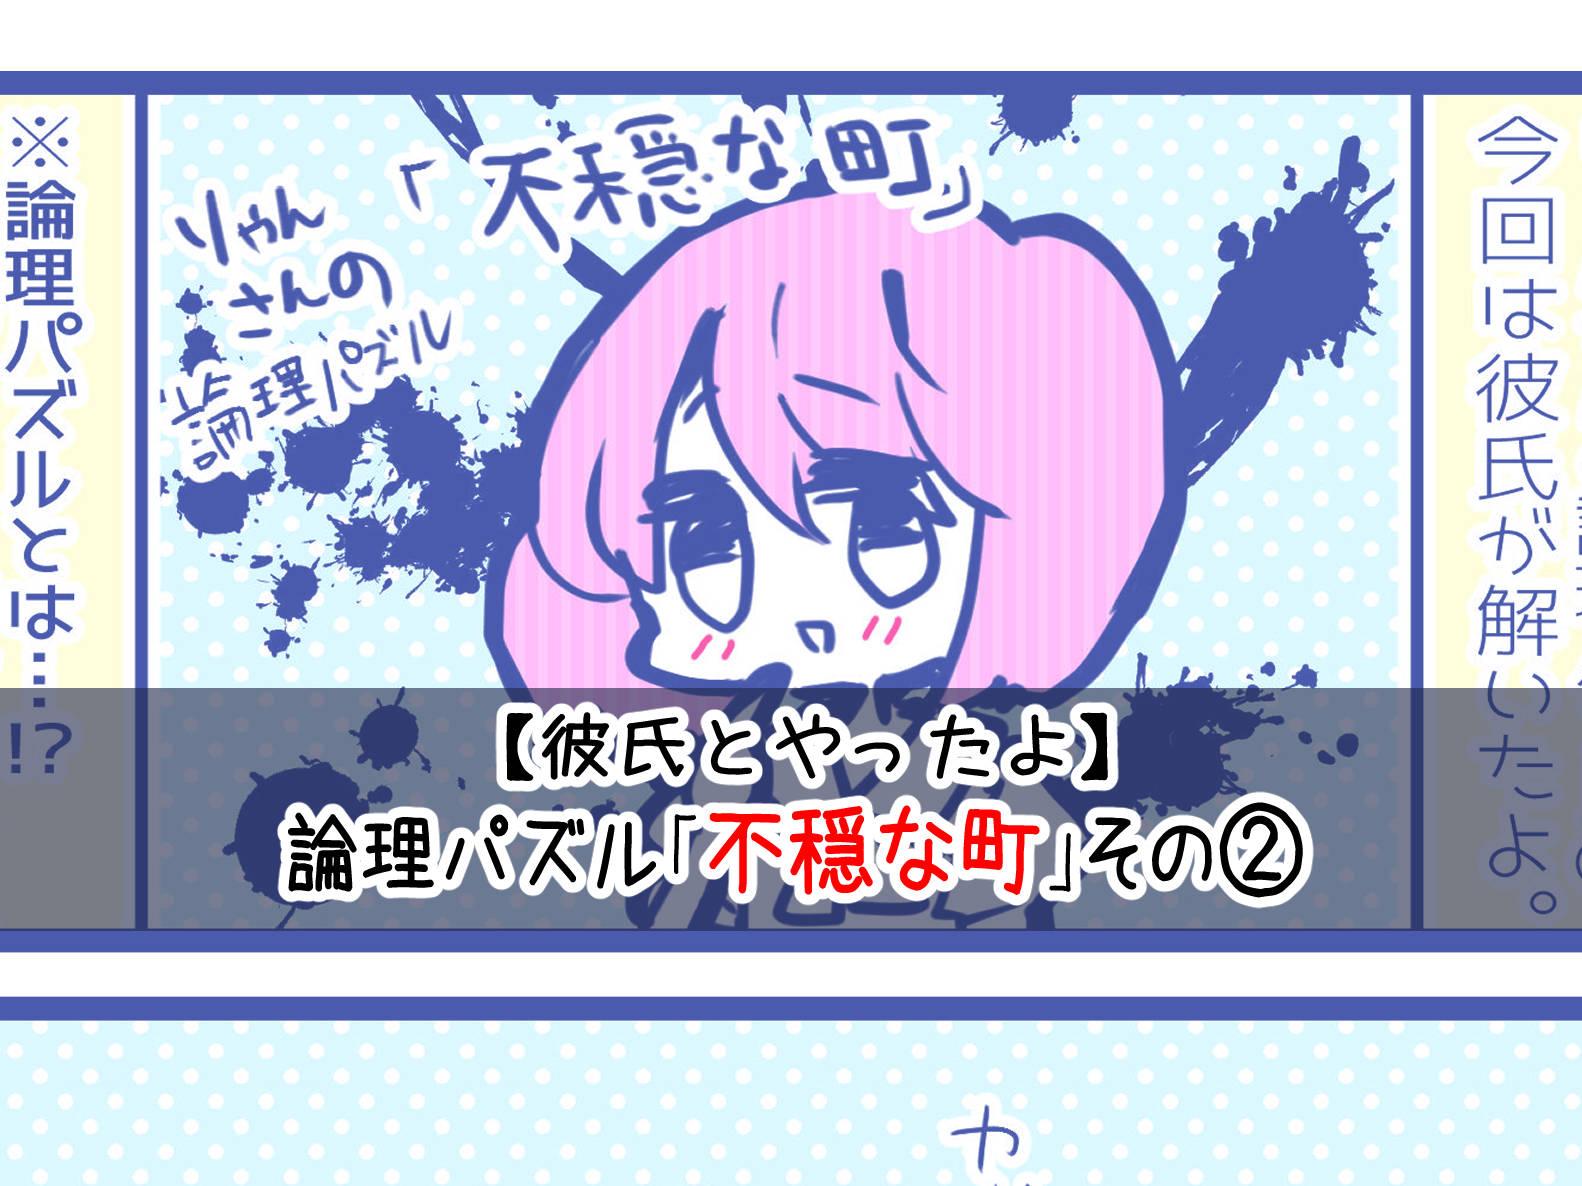 neetsadami.com_21話サムネ